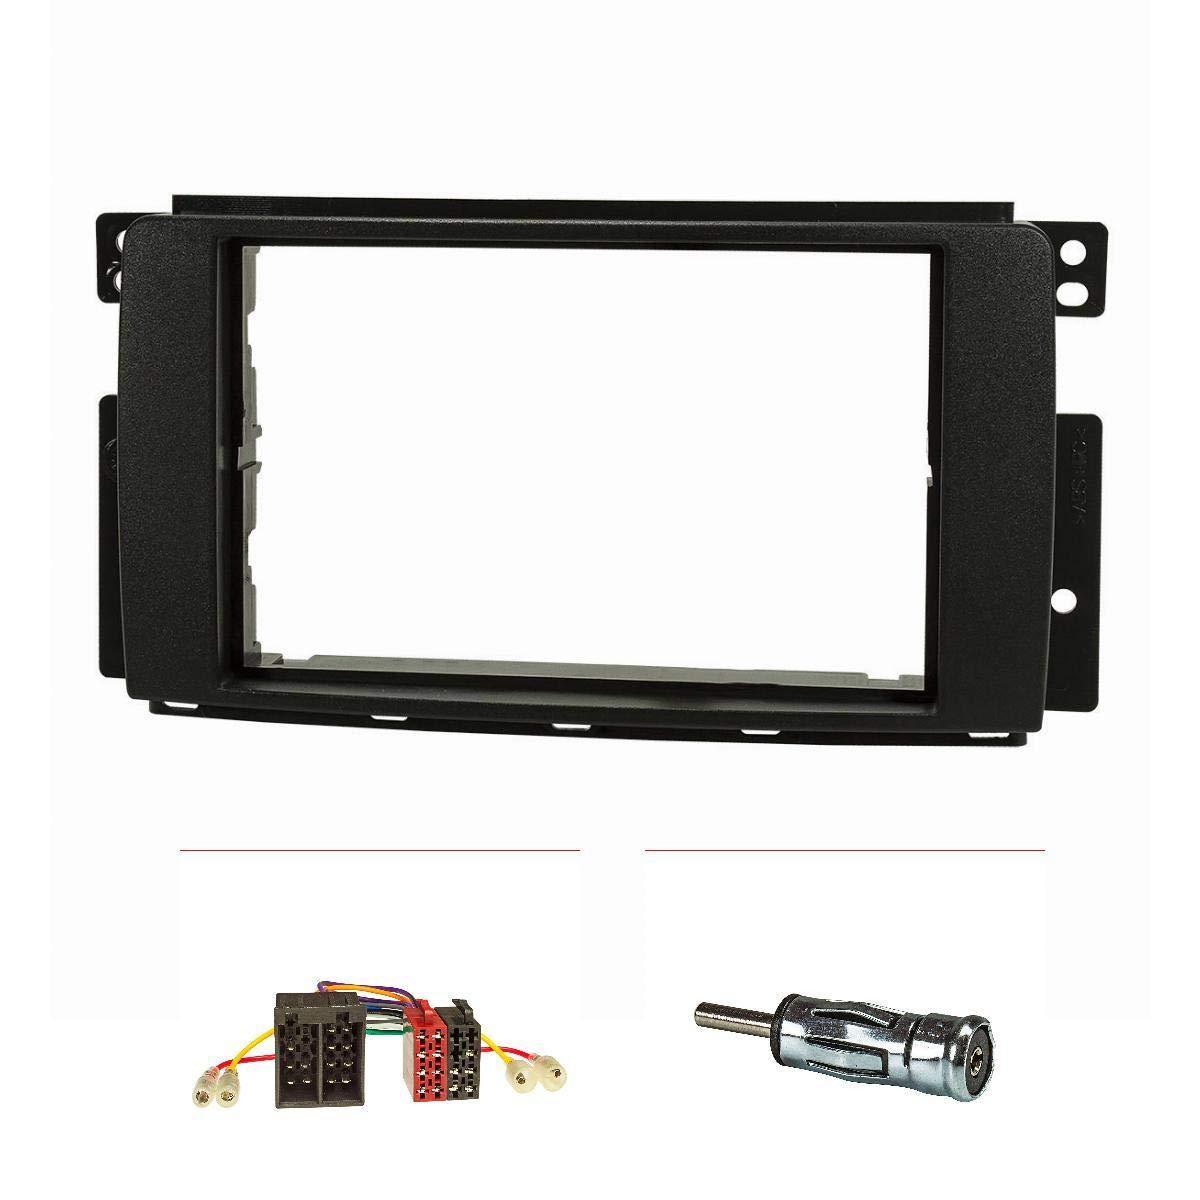 tomzz Audio 2451-000 Doppel DIN Radioblende Set passend f/ür Smart fortwo 451 forfour 454 schwarz mit Radioadapter ISO Antennenadapter ISO DIN